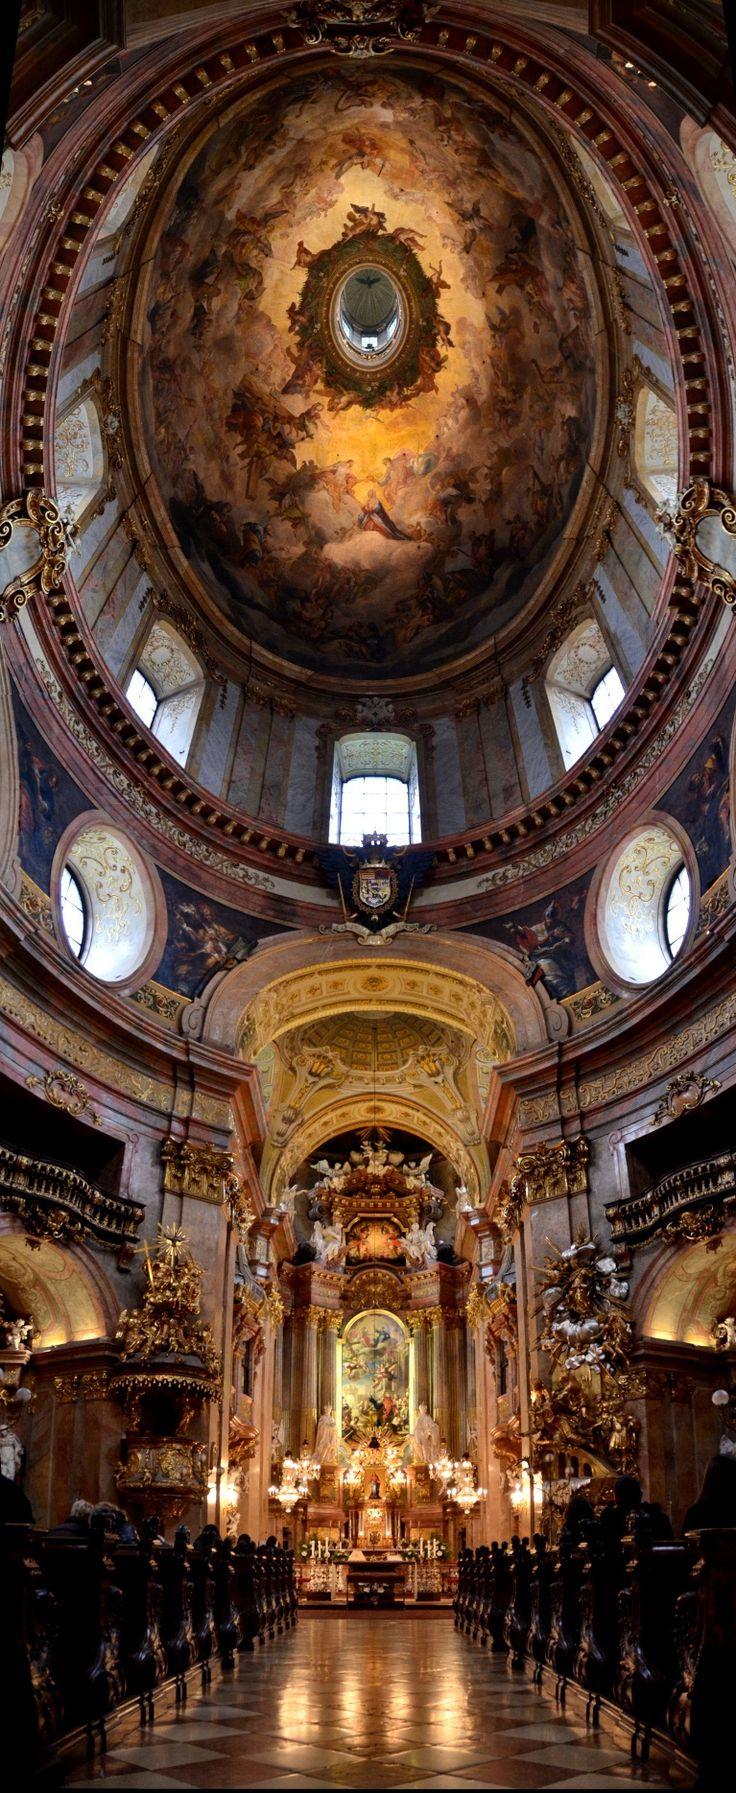 Peterskirche / St. Peter's Church / Vienna, Austria